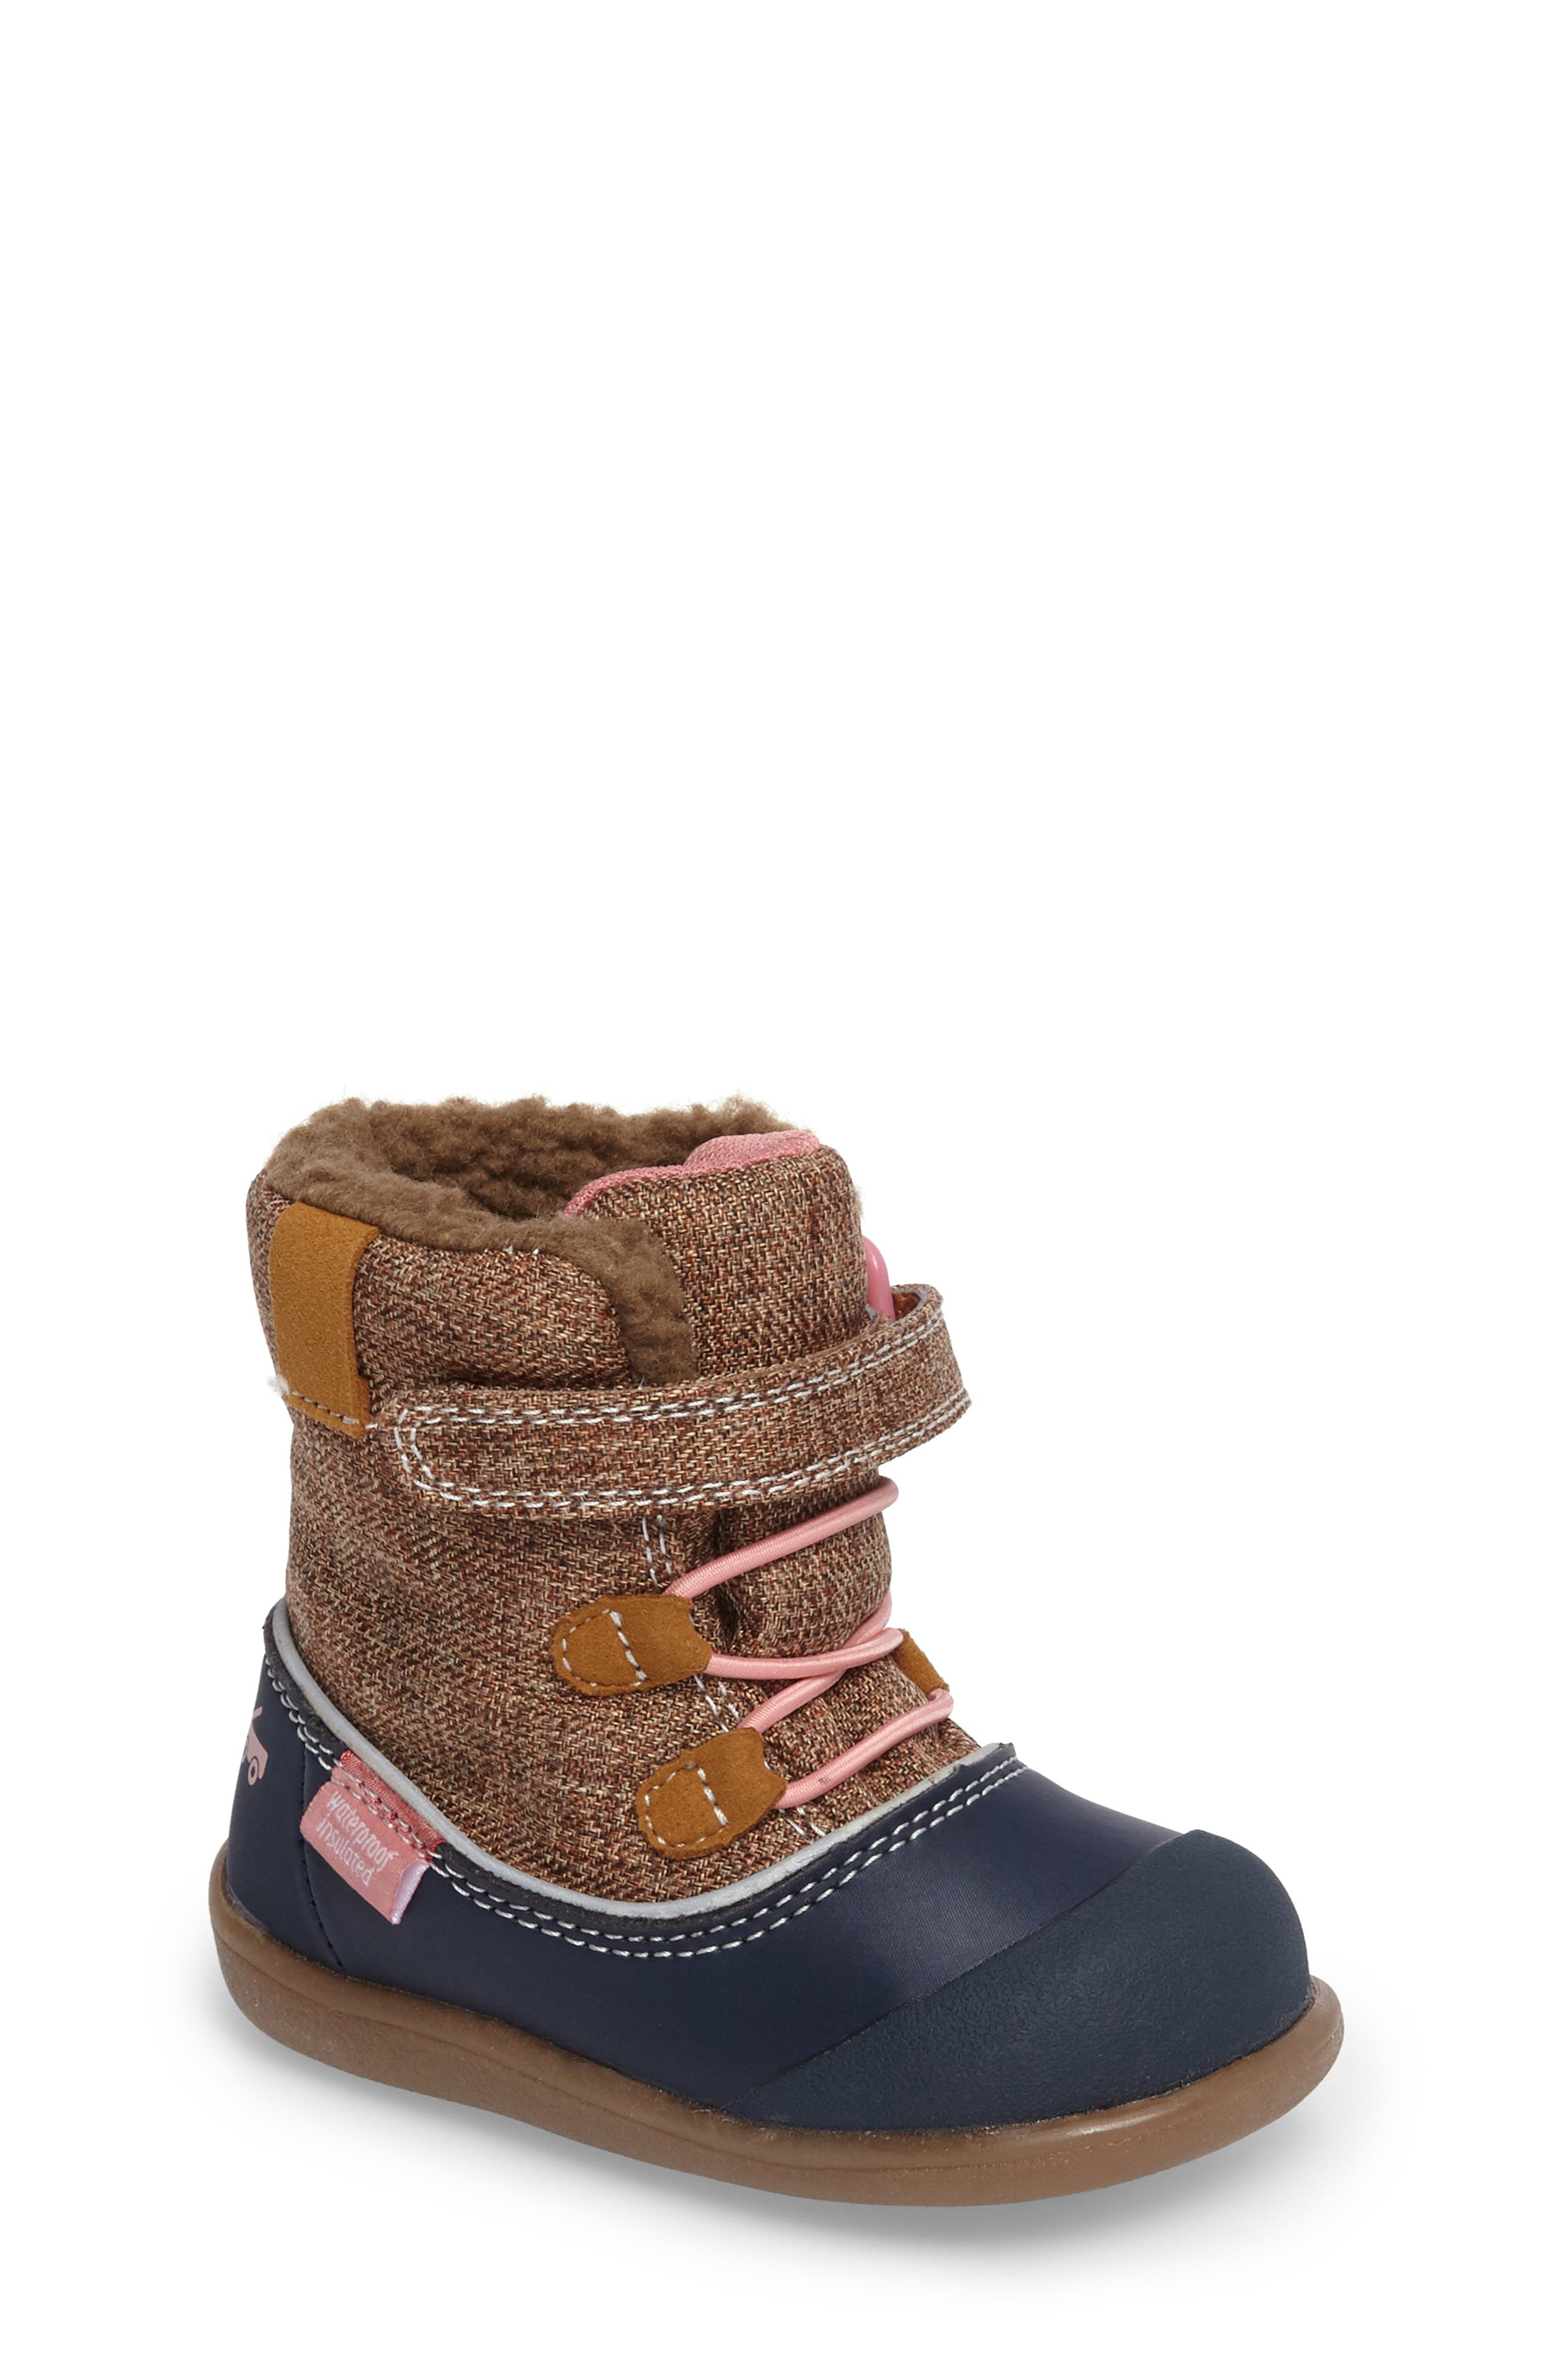 'Abby' Waterproof Boot,                             Main thumbnail 1, color,                             Brown